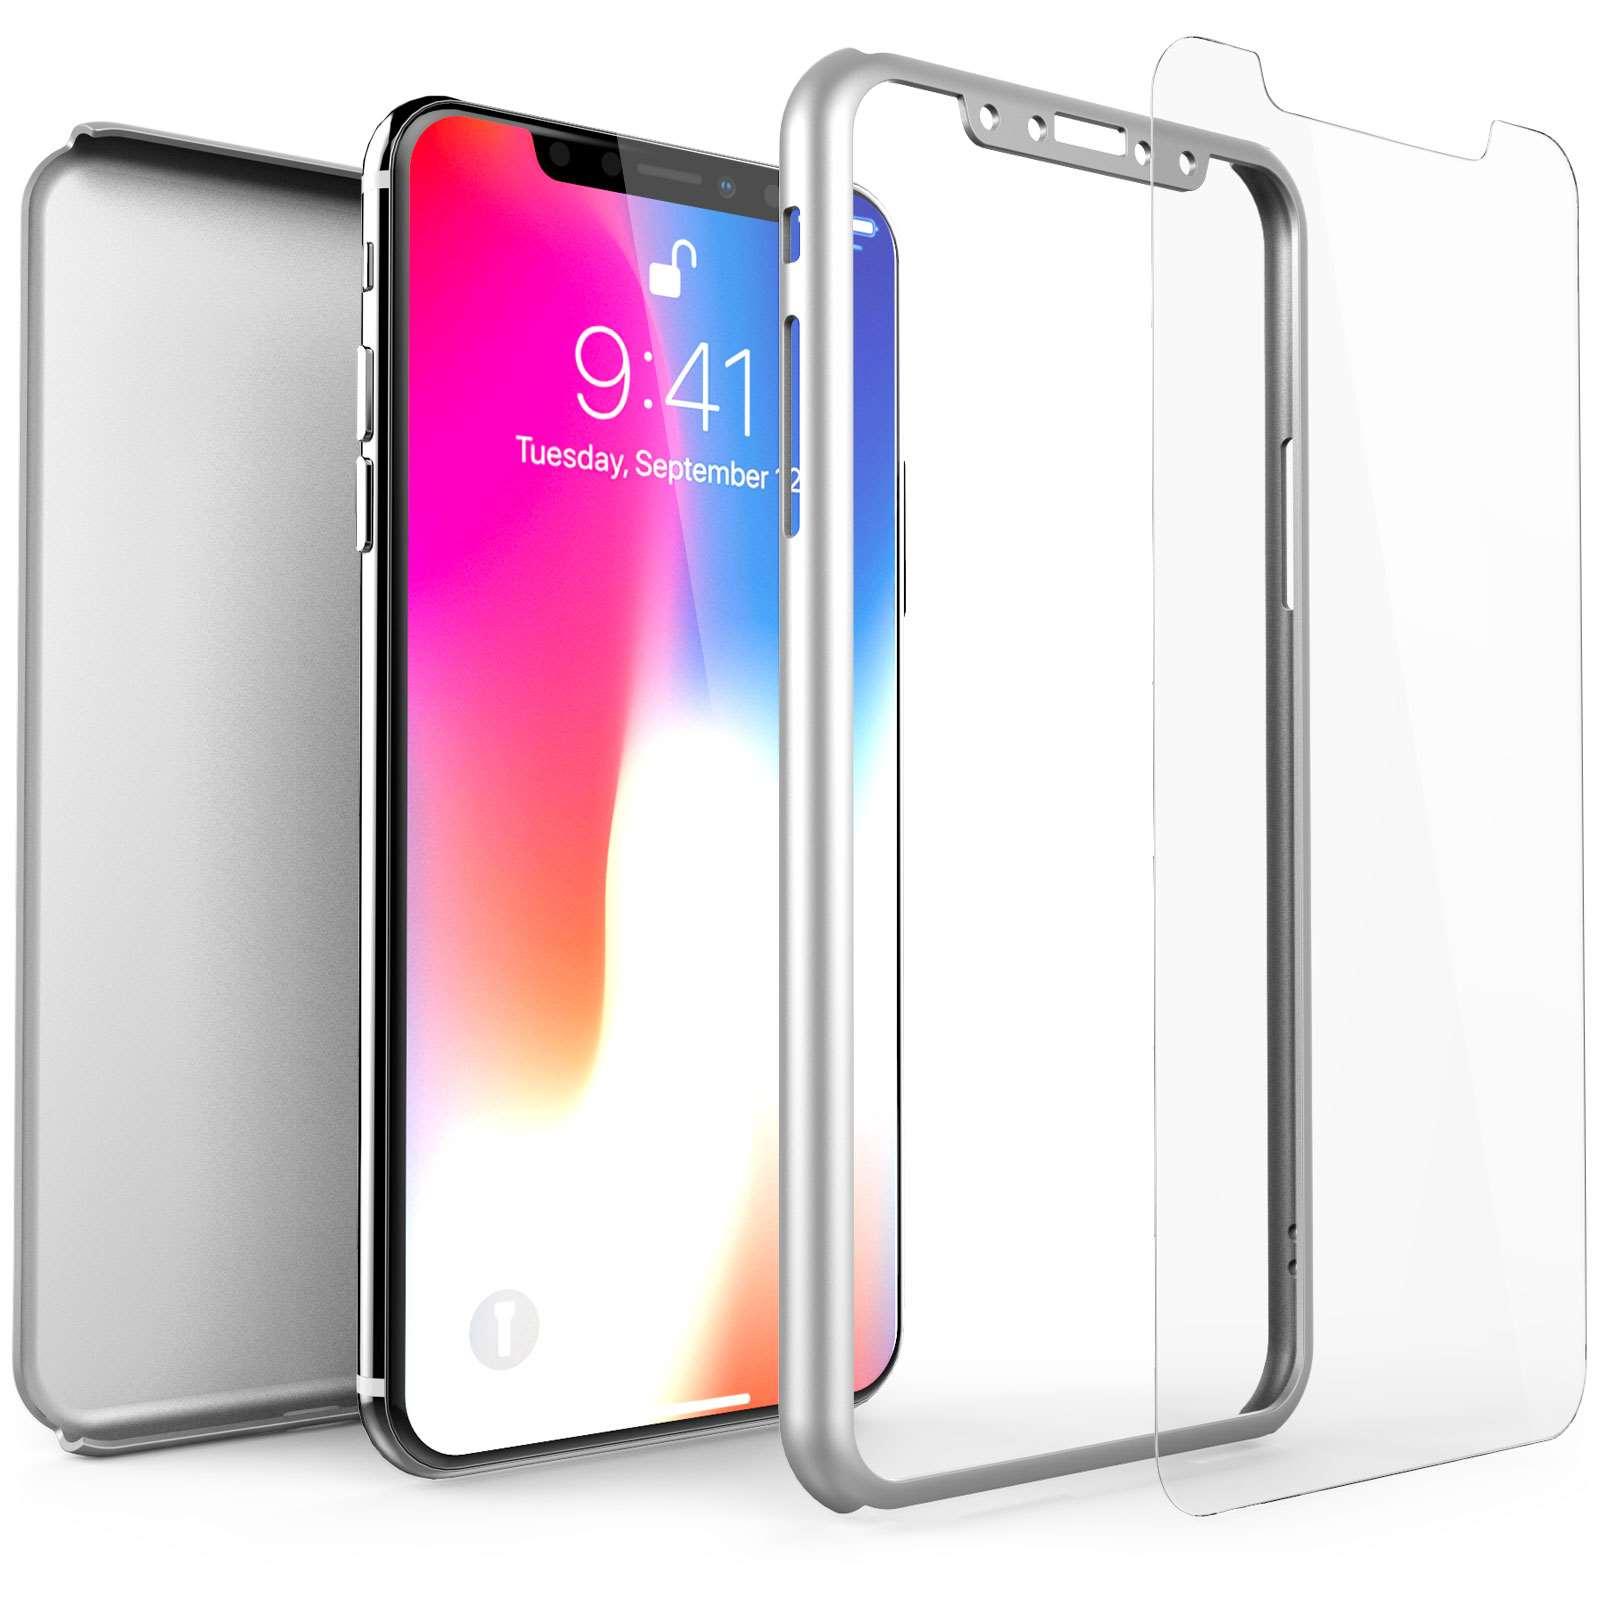 Centopi Θήκη Hybrid 360° iPhone X / XS & Tempered Glass - Silver (CEN-APP-514)